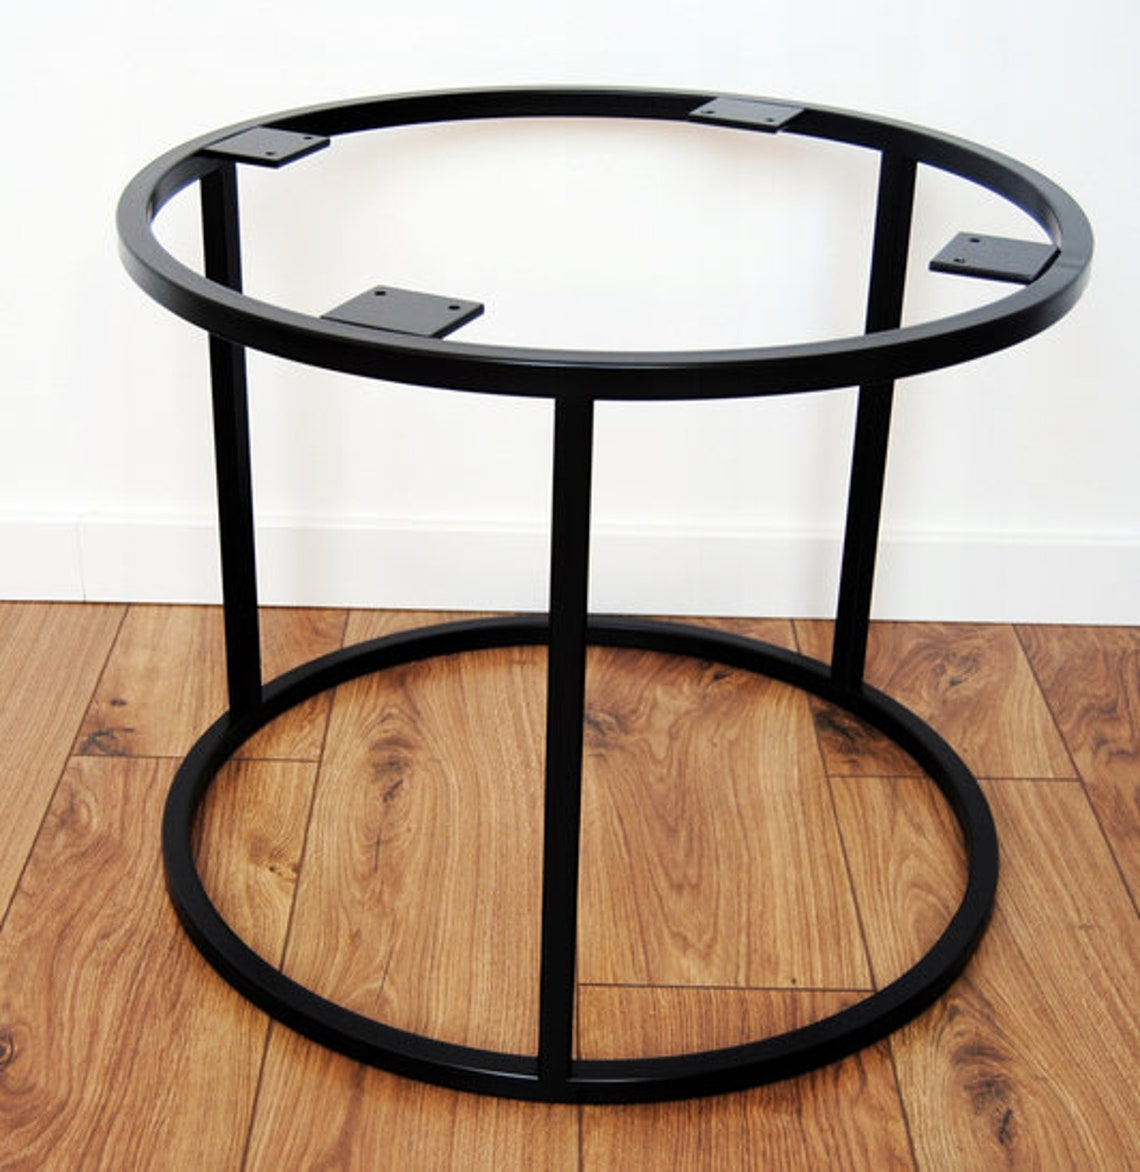 round coffee steel table base , table legs, metal table legs, coffe table legs, industrial table base, tischbeine, base per il tavolo